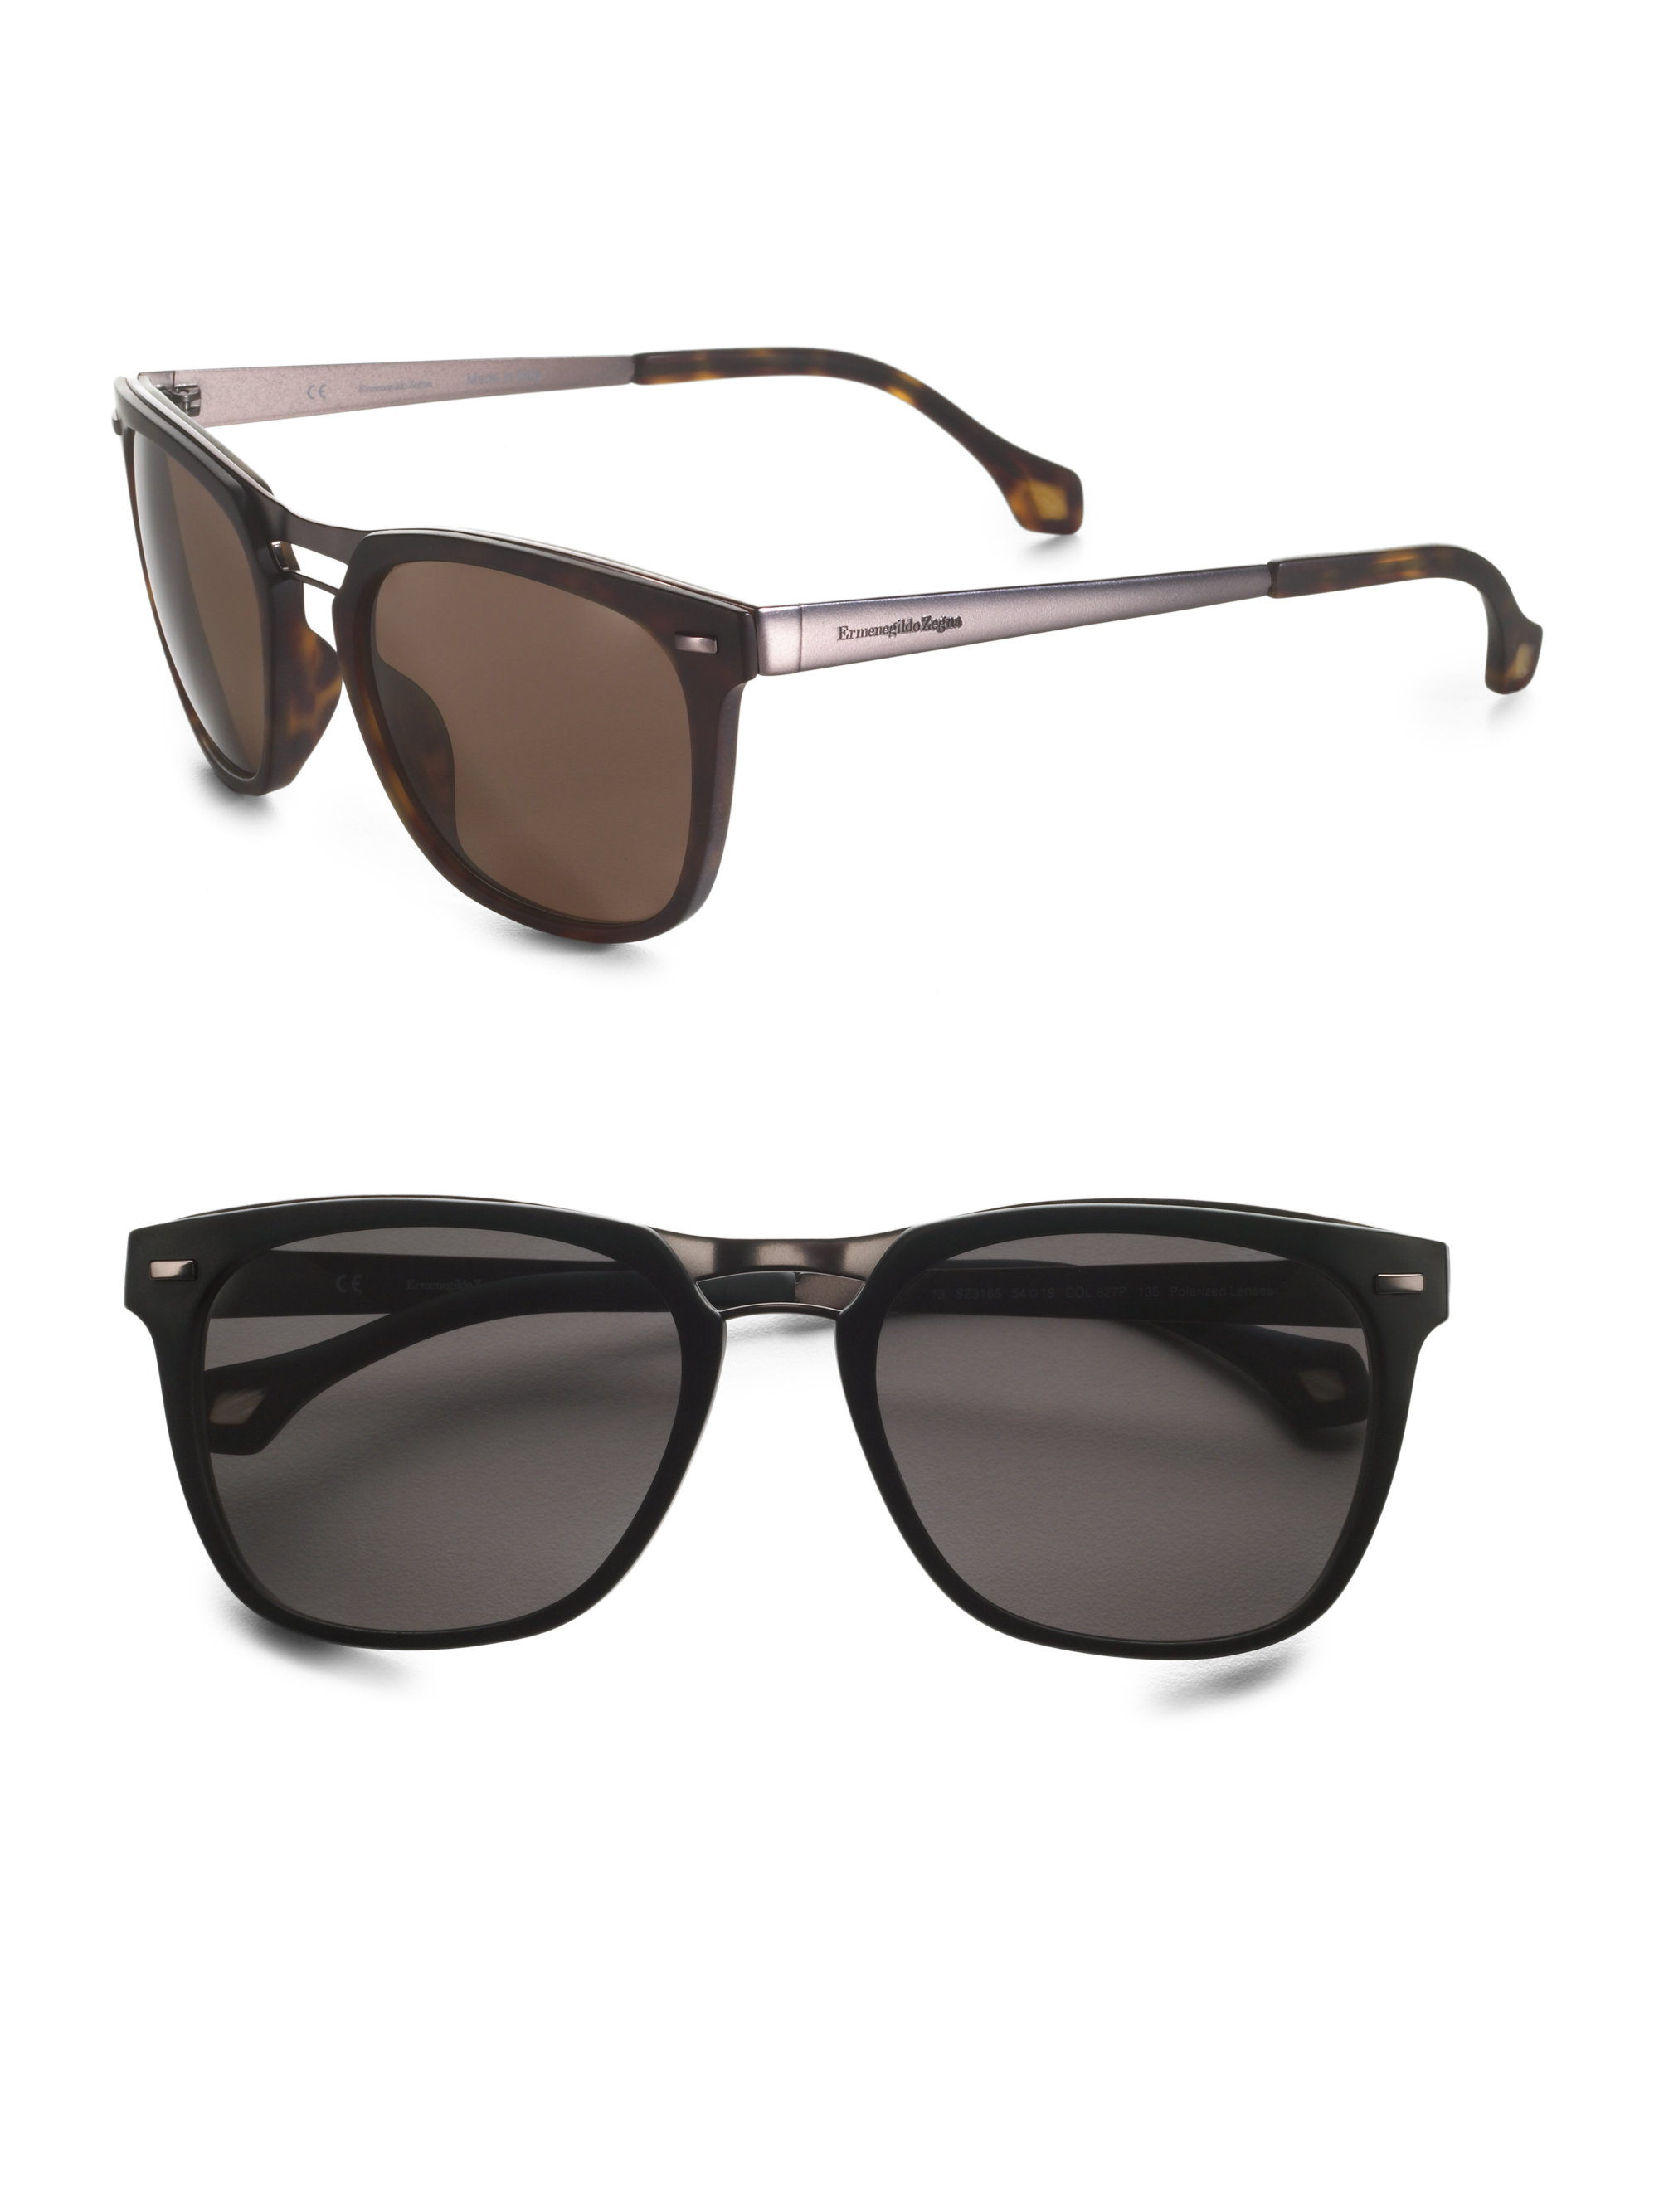 Zegna Sunglasses  ermenegildo zegna vintage wayfarer sunglasses in black for men lyst